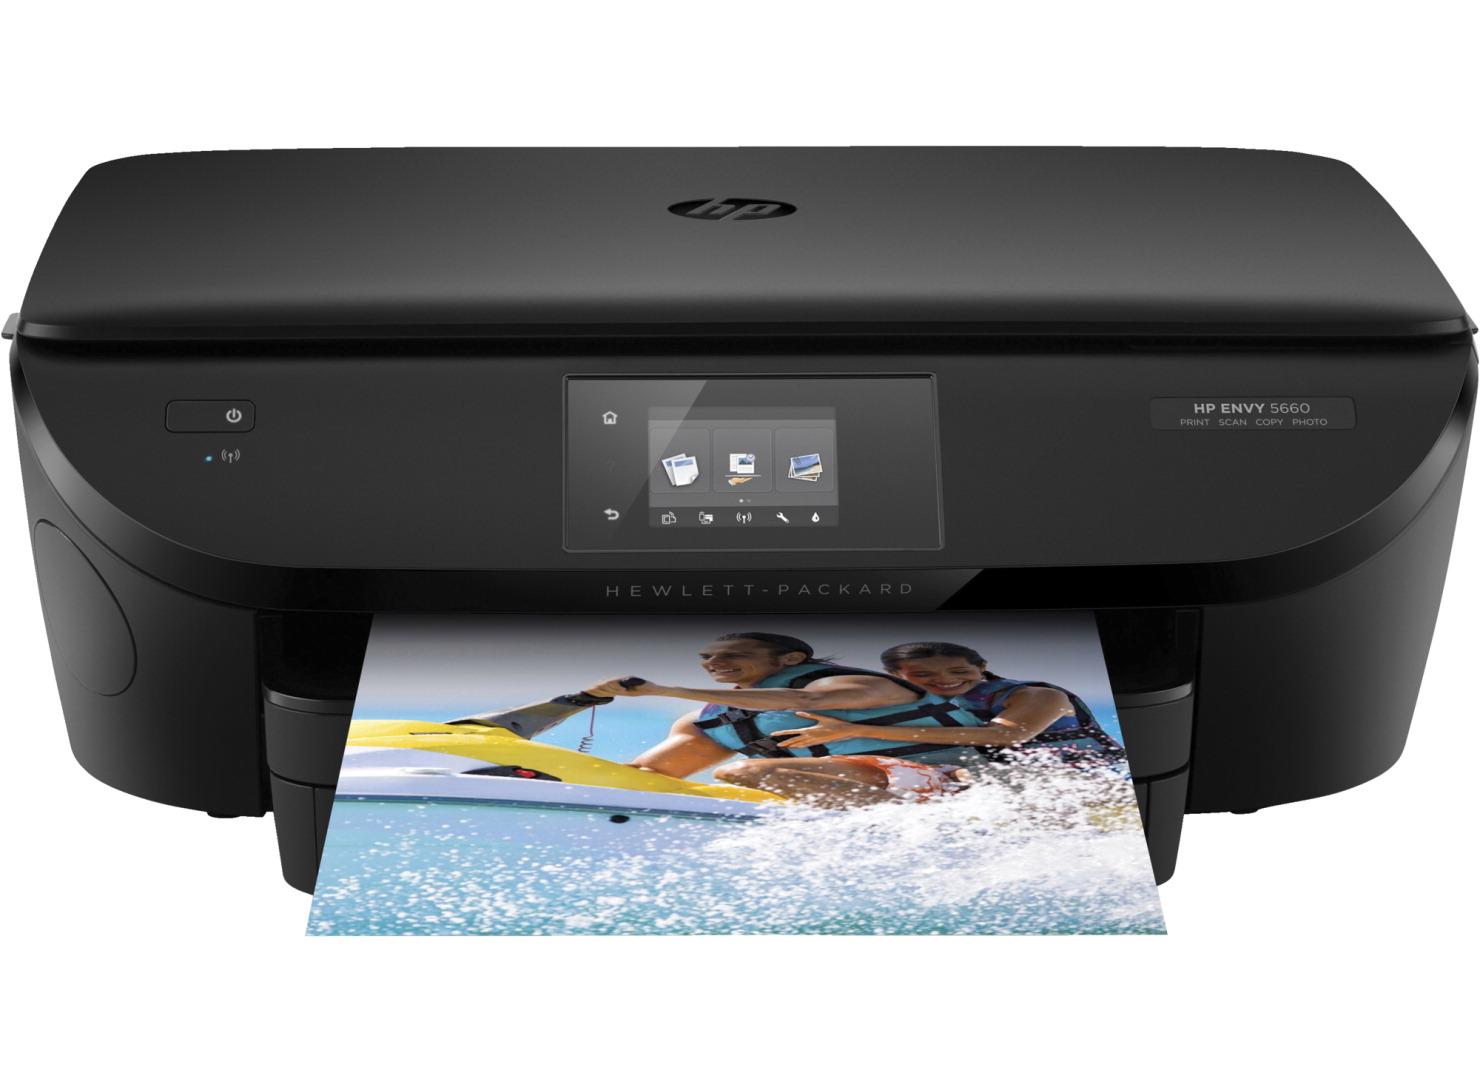 Hp Envy 5660 E All In One Printer 14 Ppm 125 Sheet